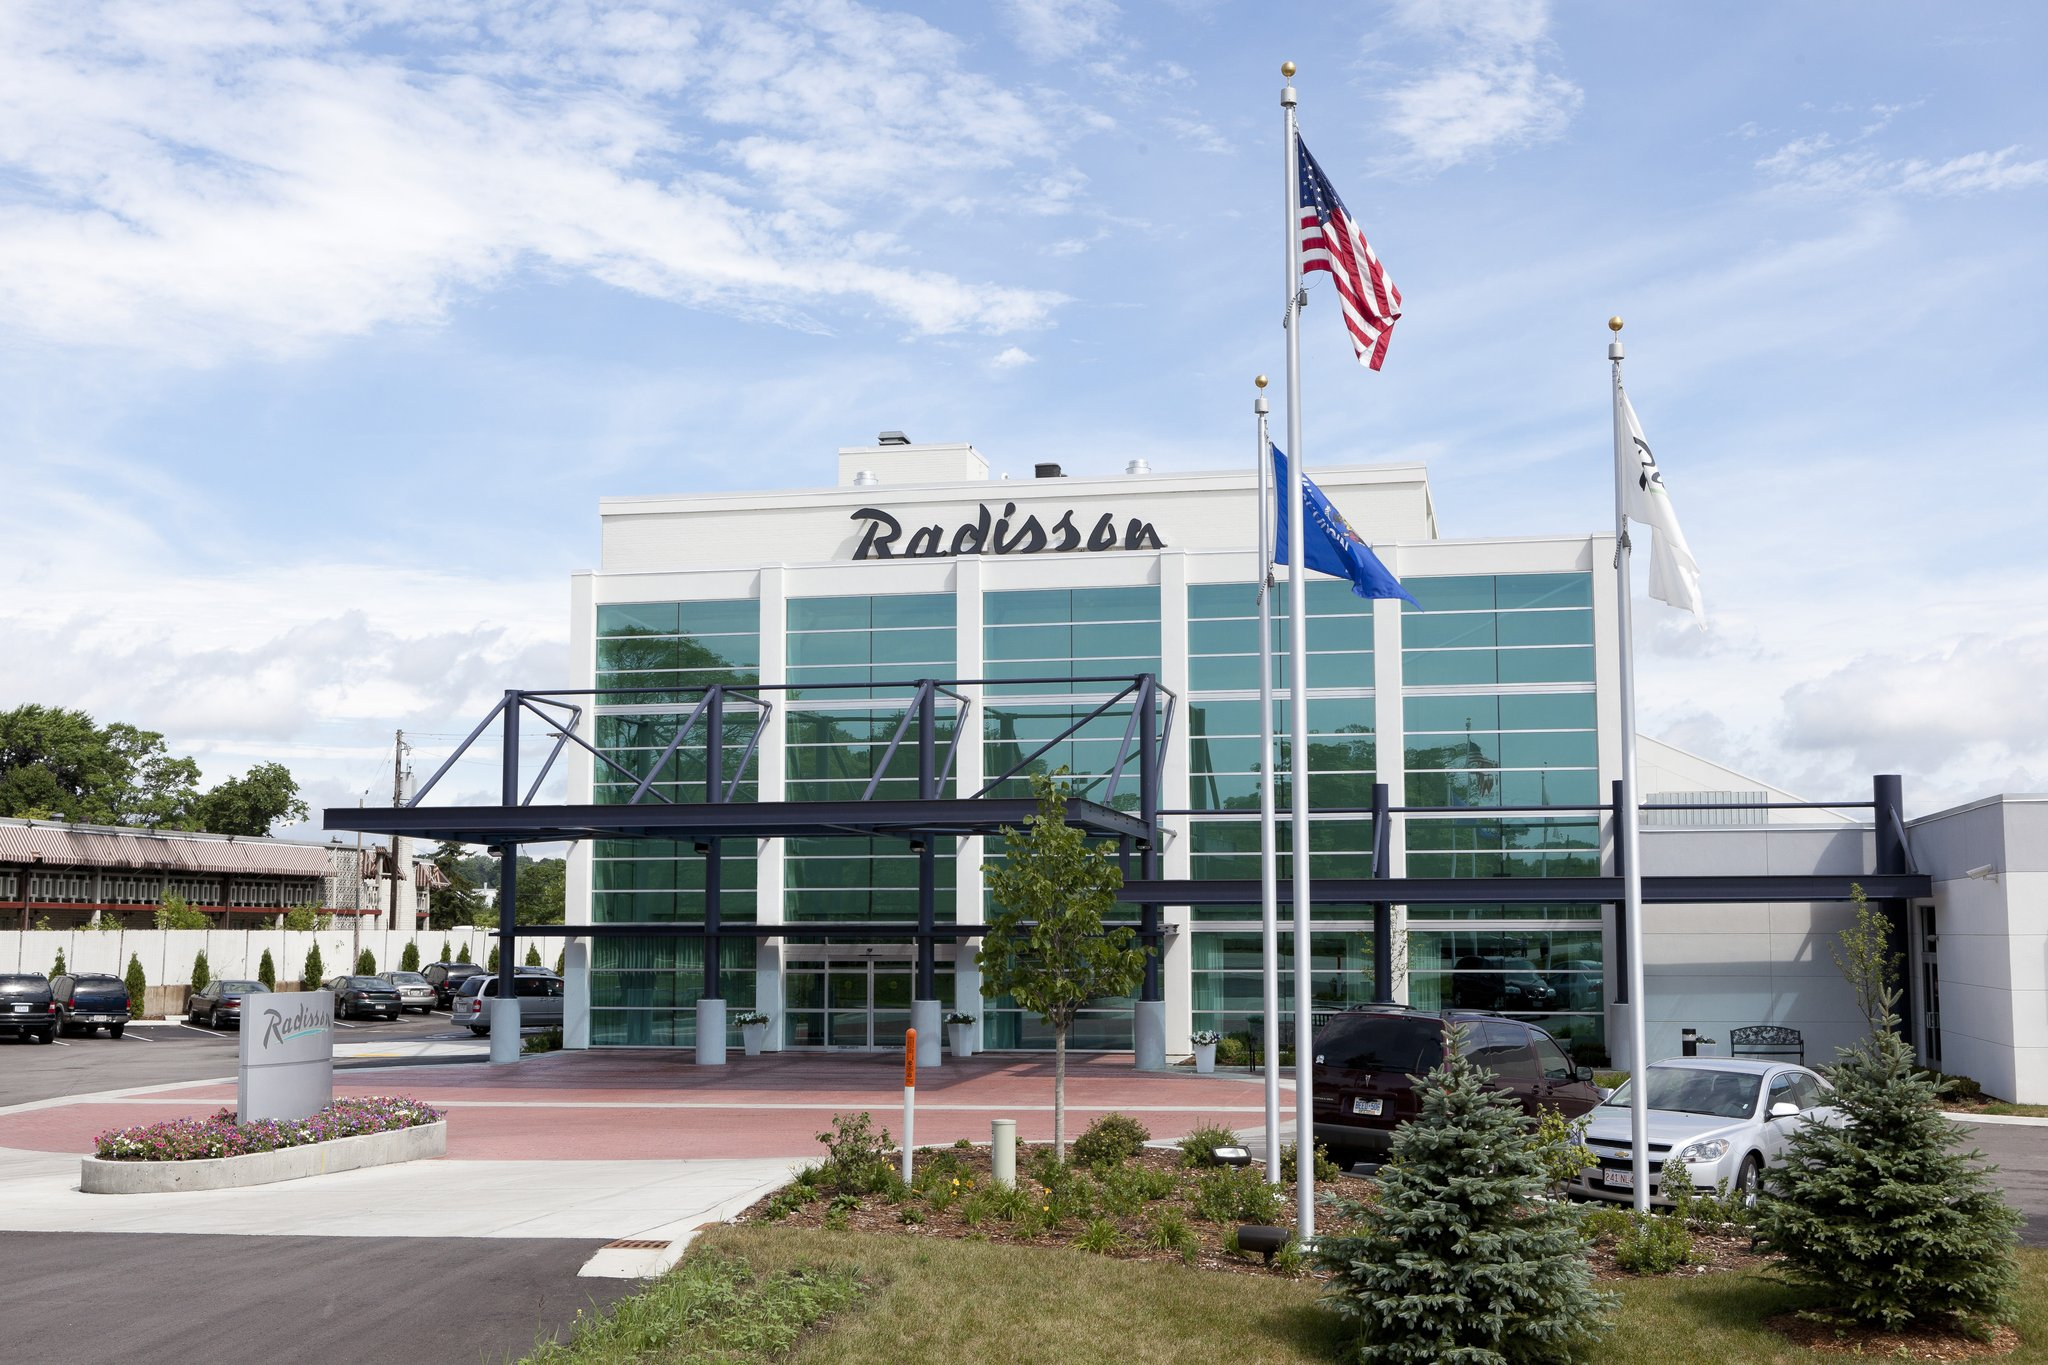 Radisson Hotel Milwaukee NW